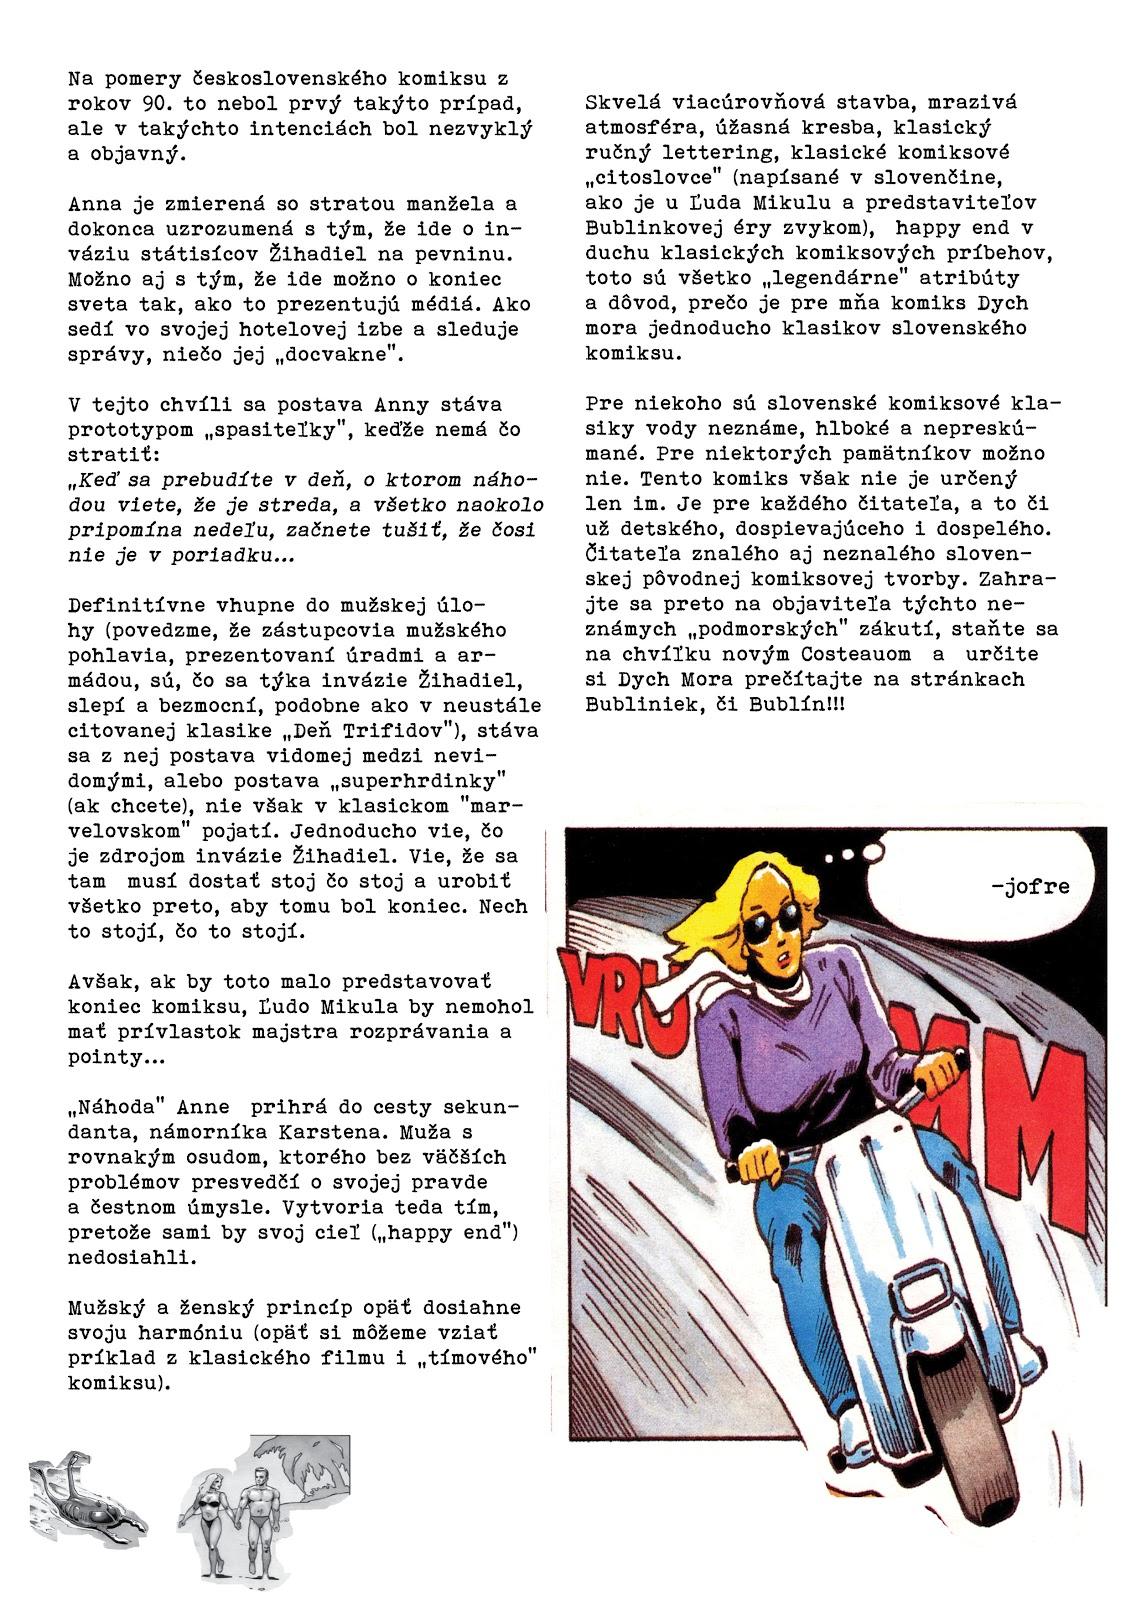 Jofre Uvadza Bubliny Comics Dych Mora ľuda Mikulu